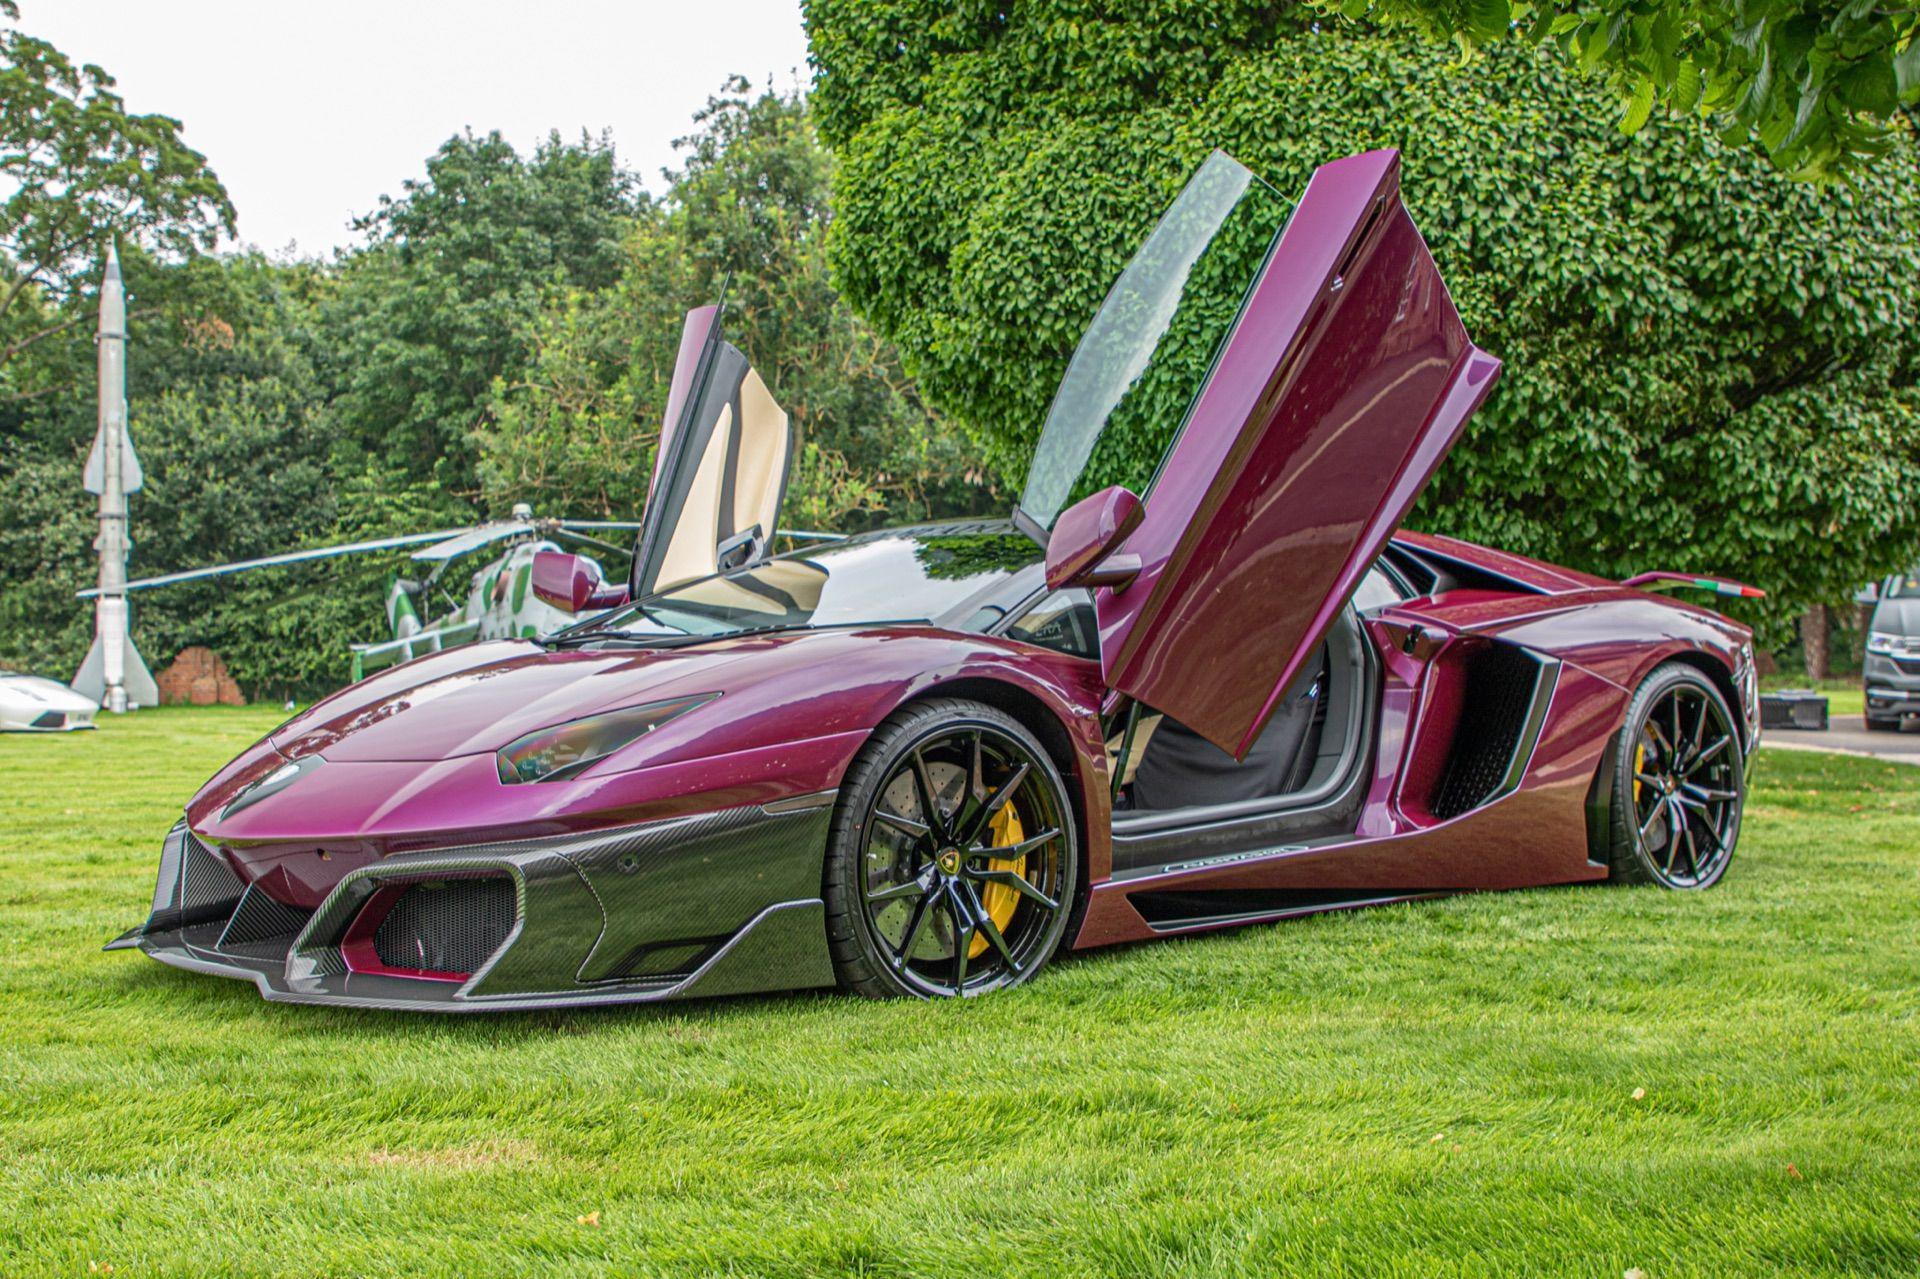 Huber-Era-Lamborghini-Aventador-9